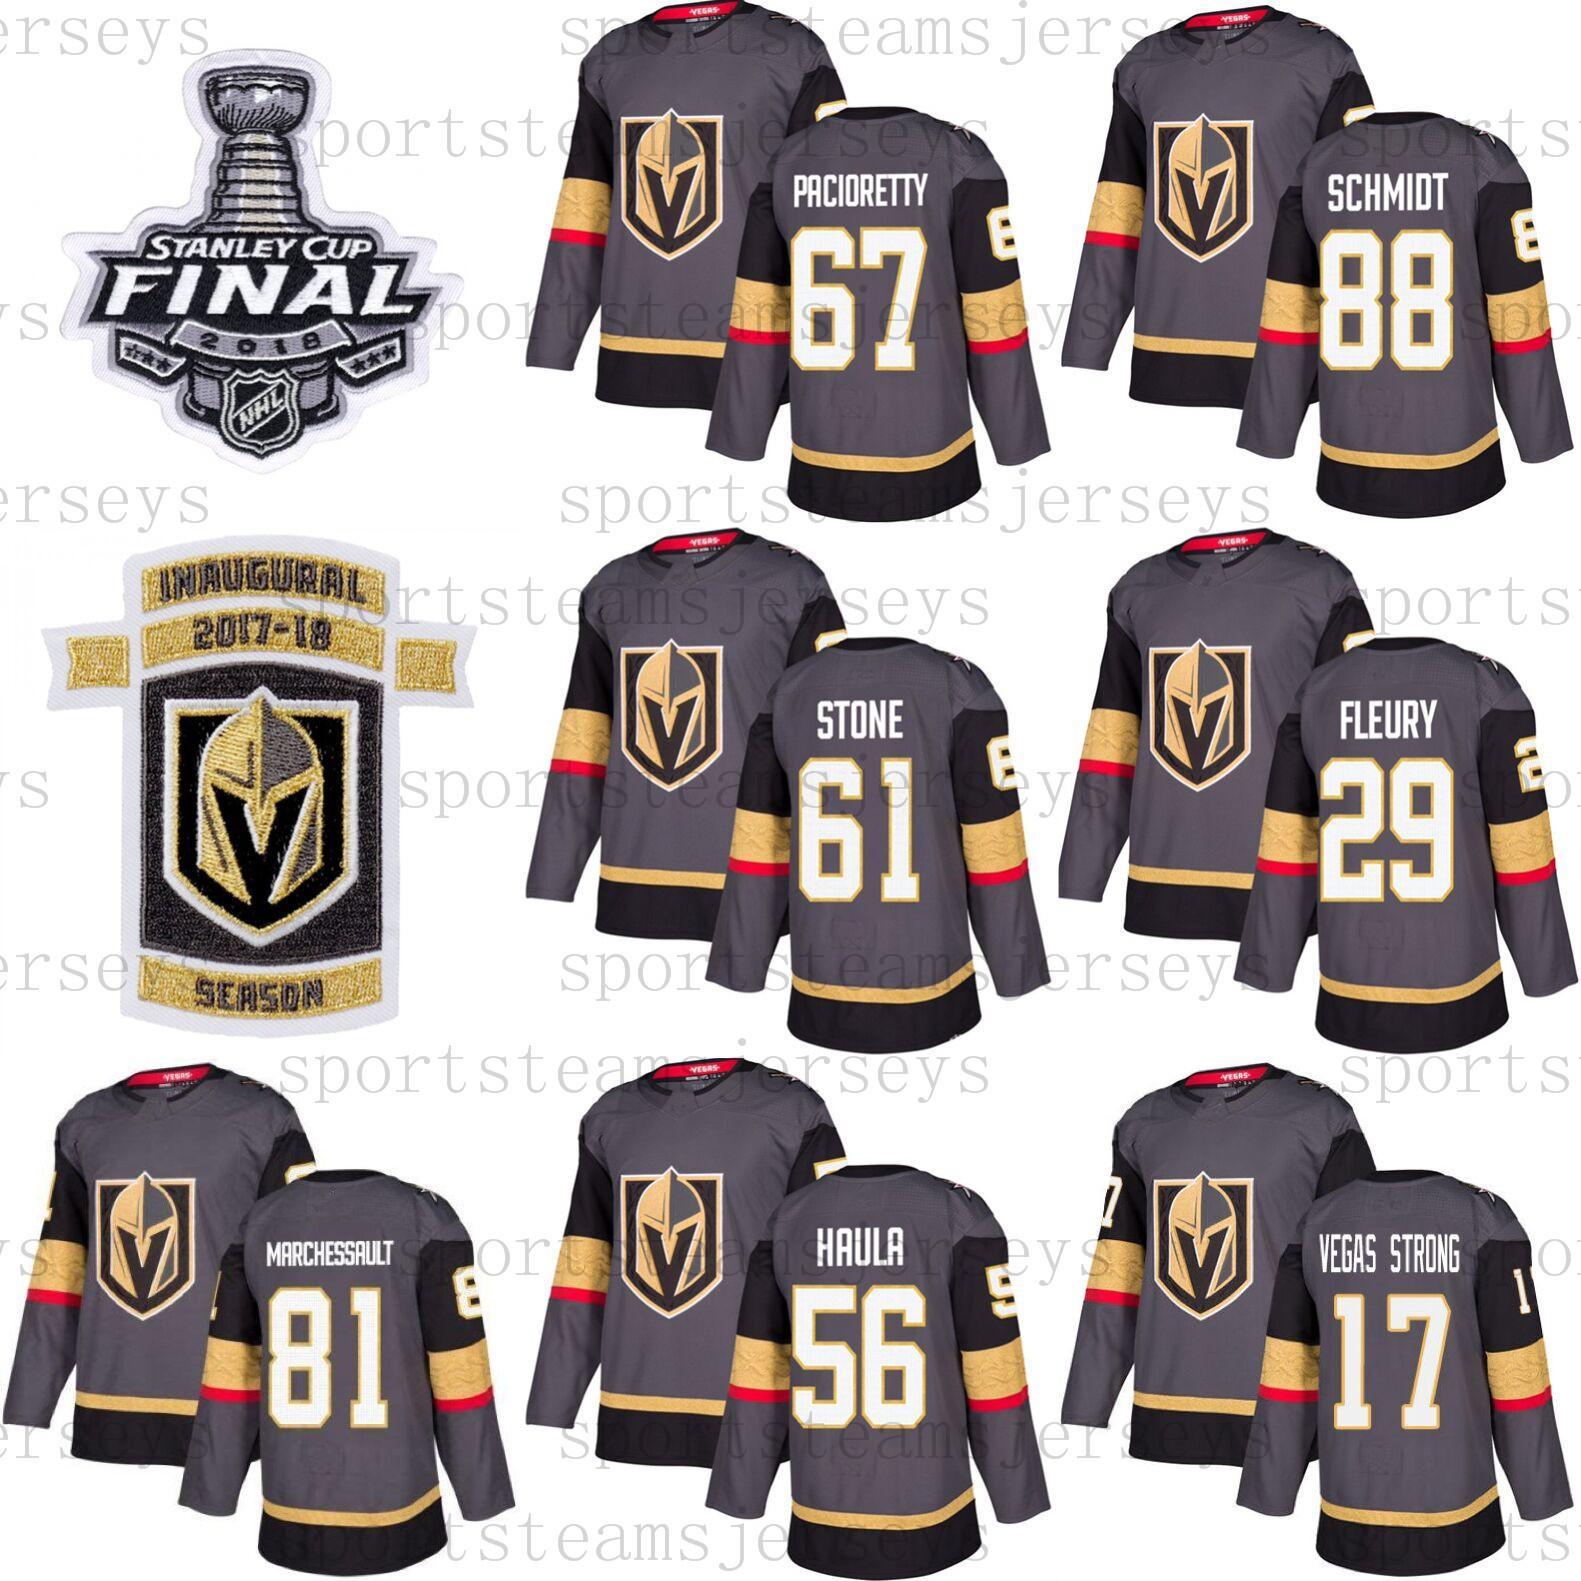 super popular af4df 17748 Vegas Golden Knights Jersey 67 Max Pacioretty 29 Marc-Andre Fleury 56 Erik  Haula Nate Schmidt Hockey Men Women Youth 2019 Stanley Cup Finals